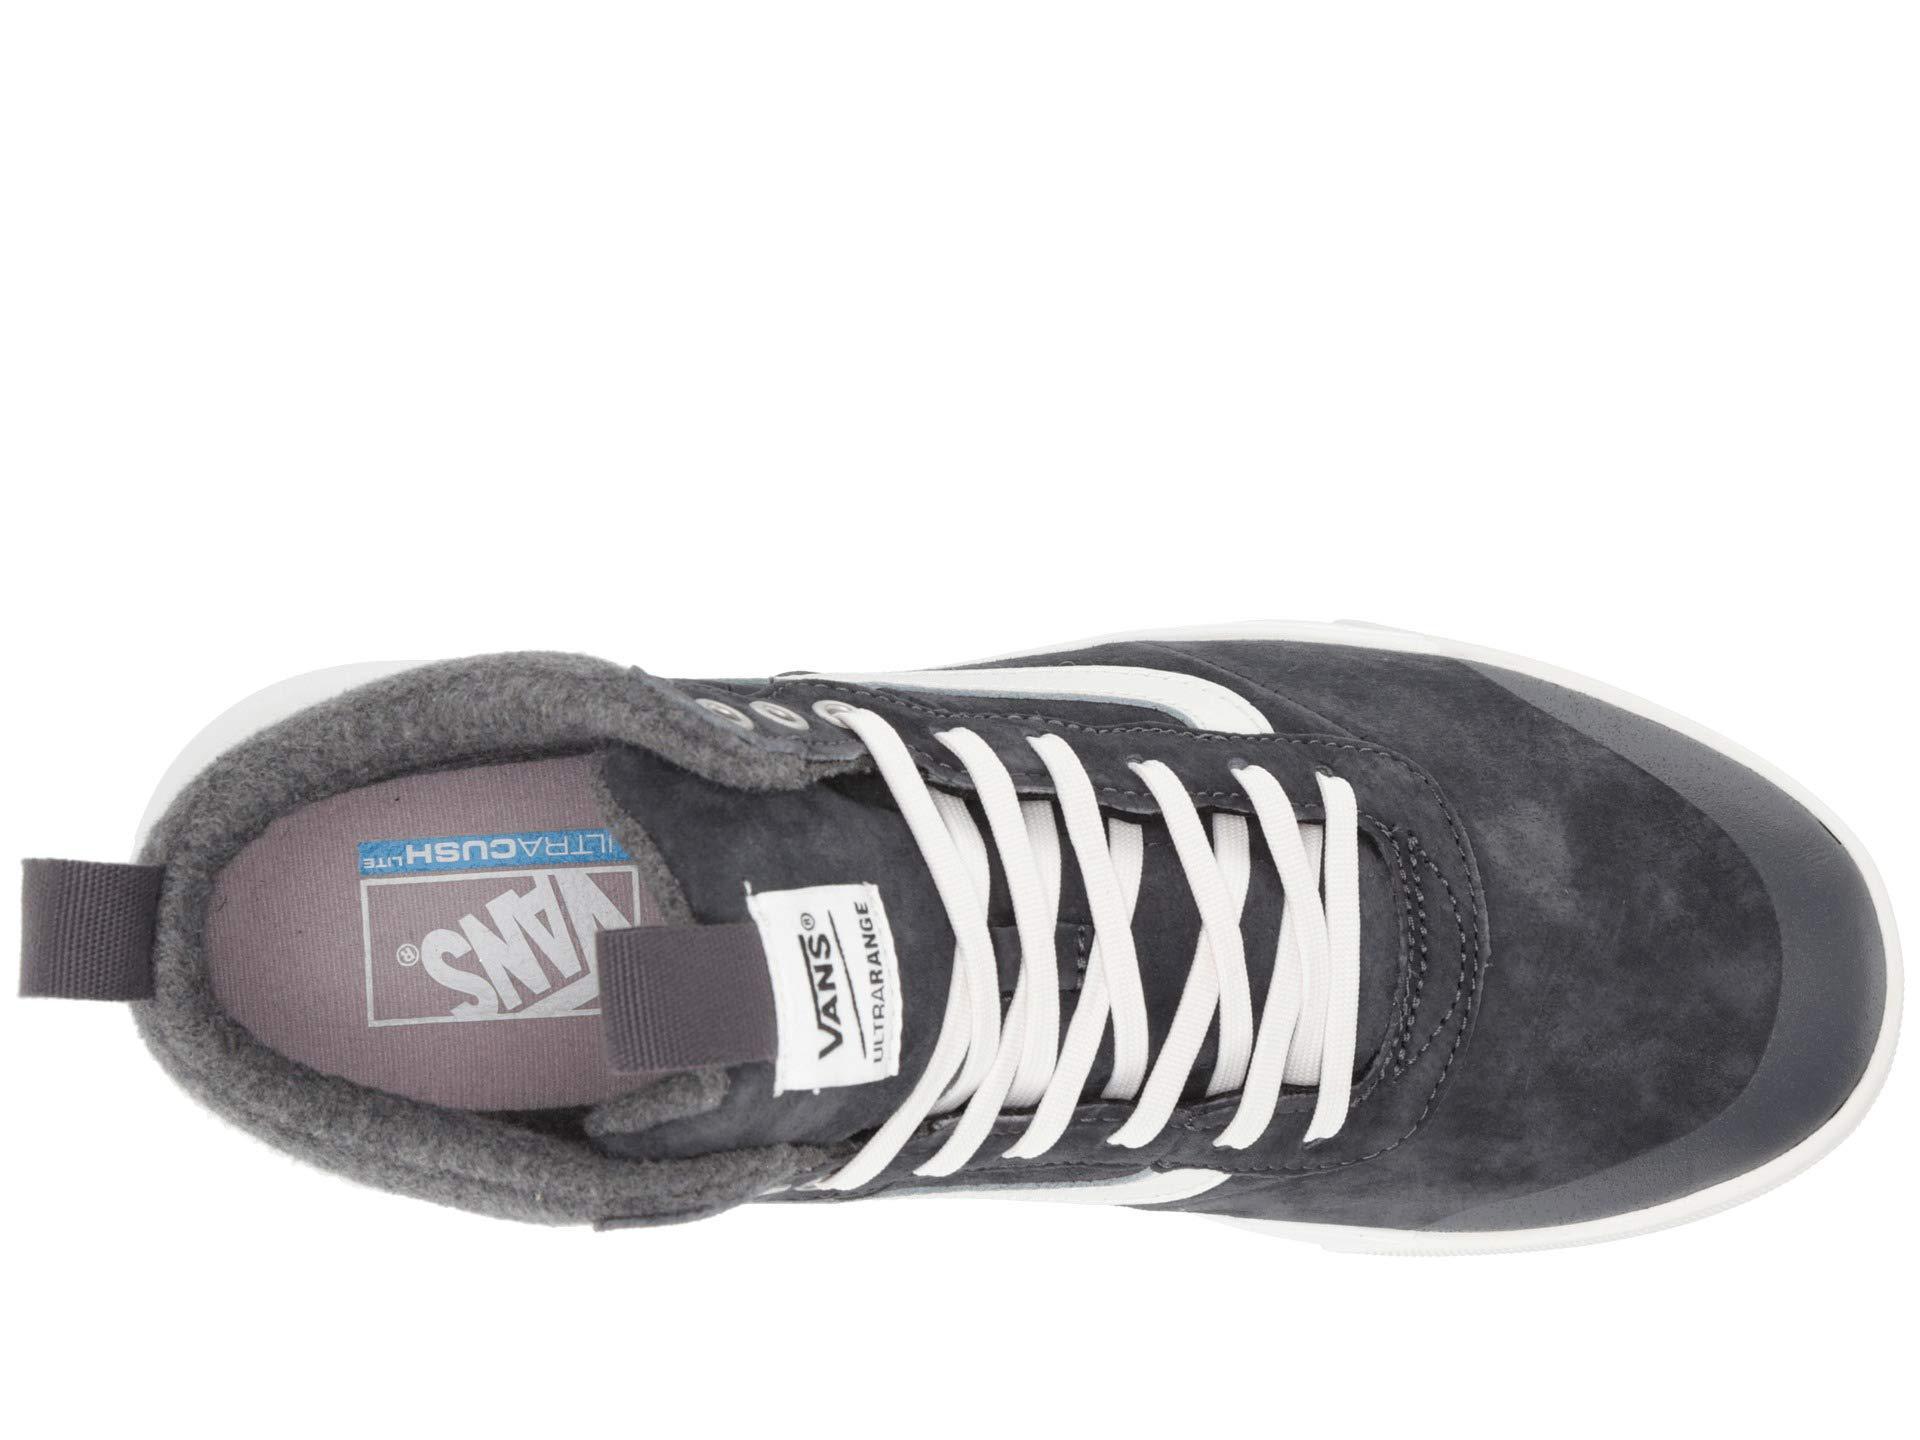 e0d2d0eeb77 Ultrarange Mte Shoes wool Frost Vans Gray Skate Lyst Hi 5qwtpaPP